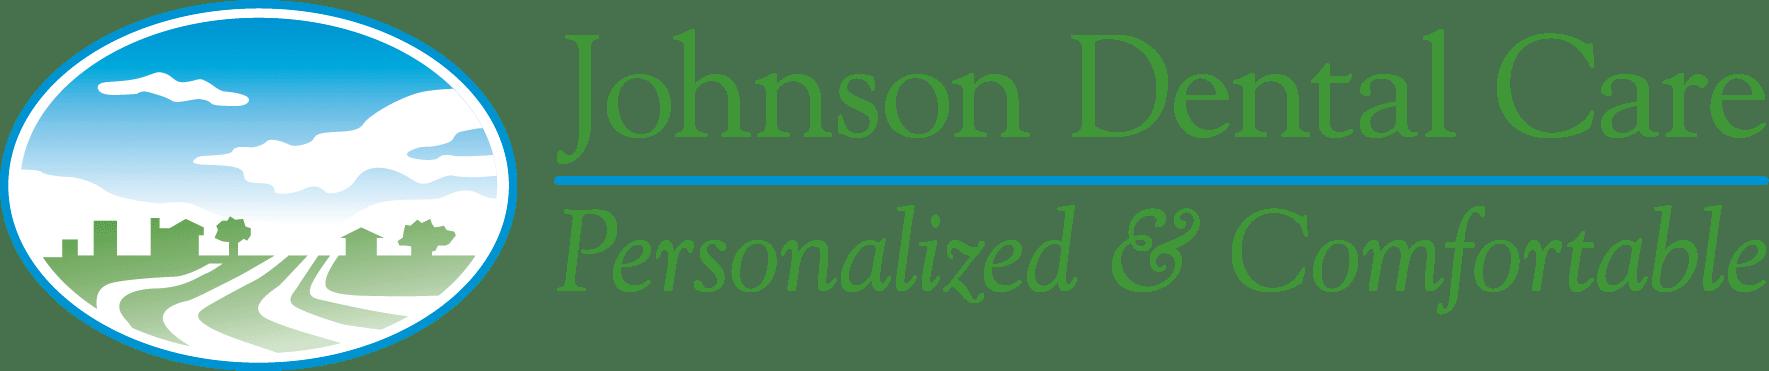 Johnson Dental Care